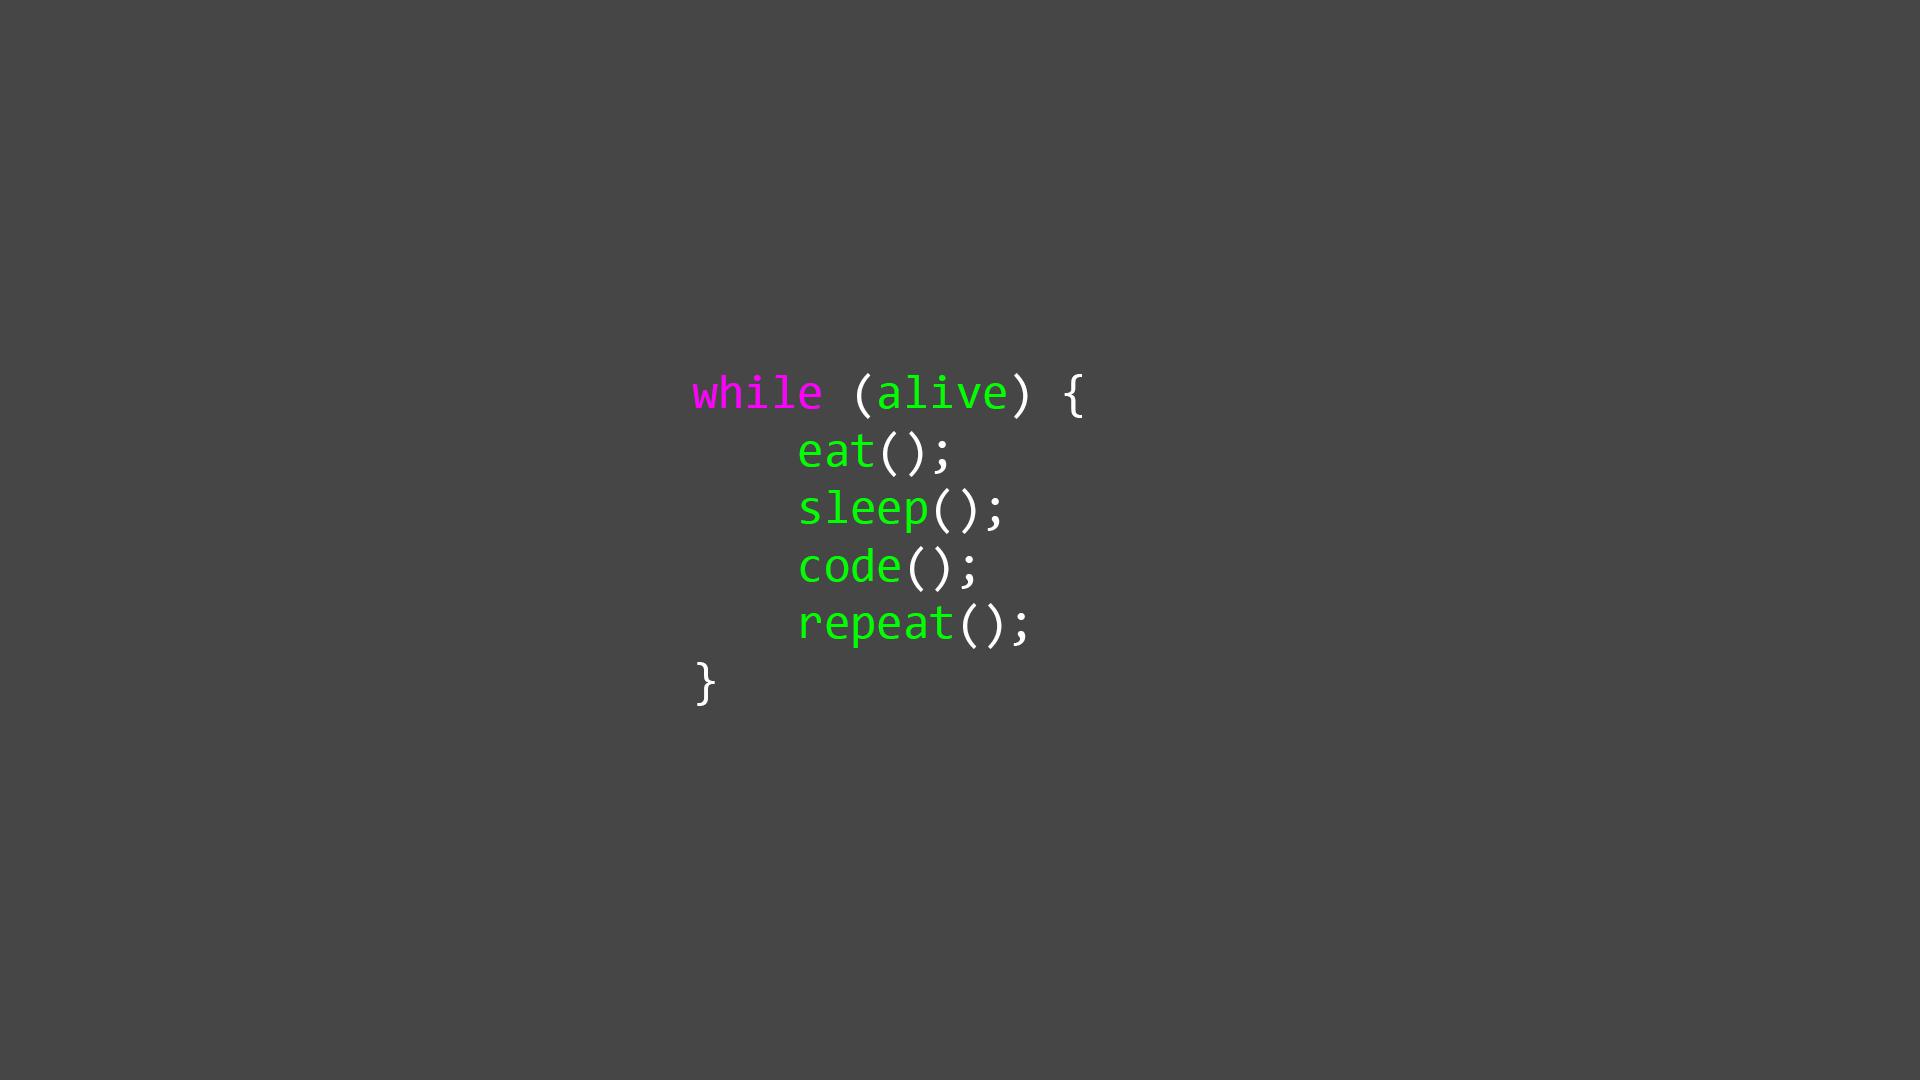 c programmer computer wallpaper - photo #10